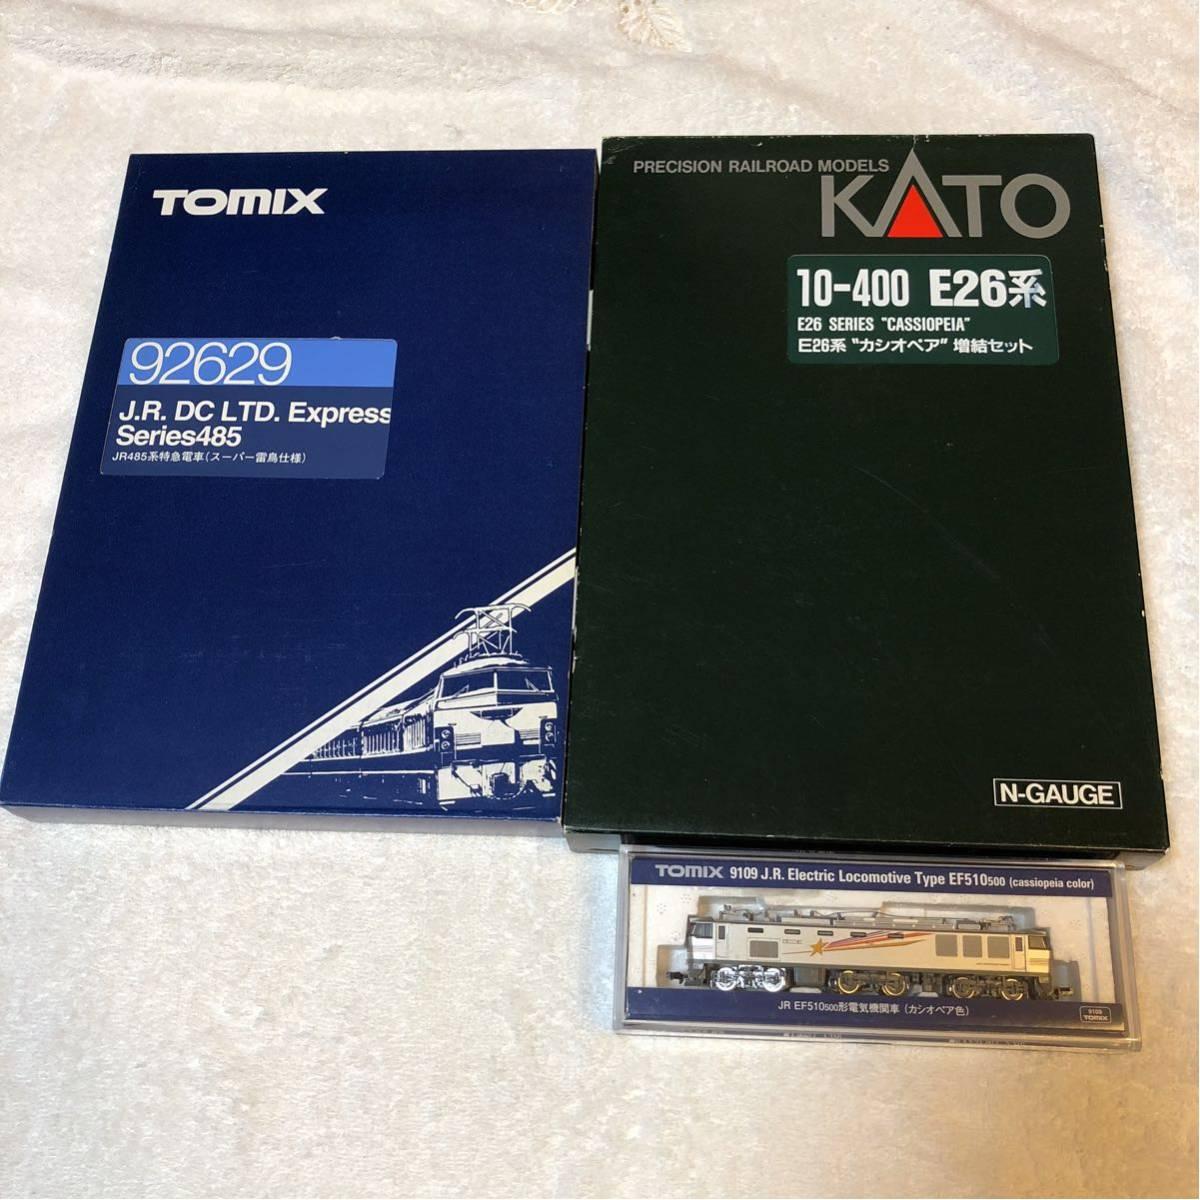 TOMIX 92629 JR485系特急電車(スーパー雷鳥仕様)+KATO 10-400 E26系「カシオペア」増結セット+ TOMIX 9109 JR EF510 500形電気機関車1両